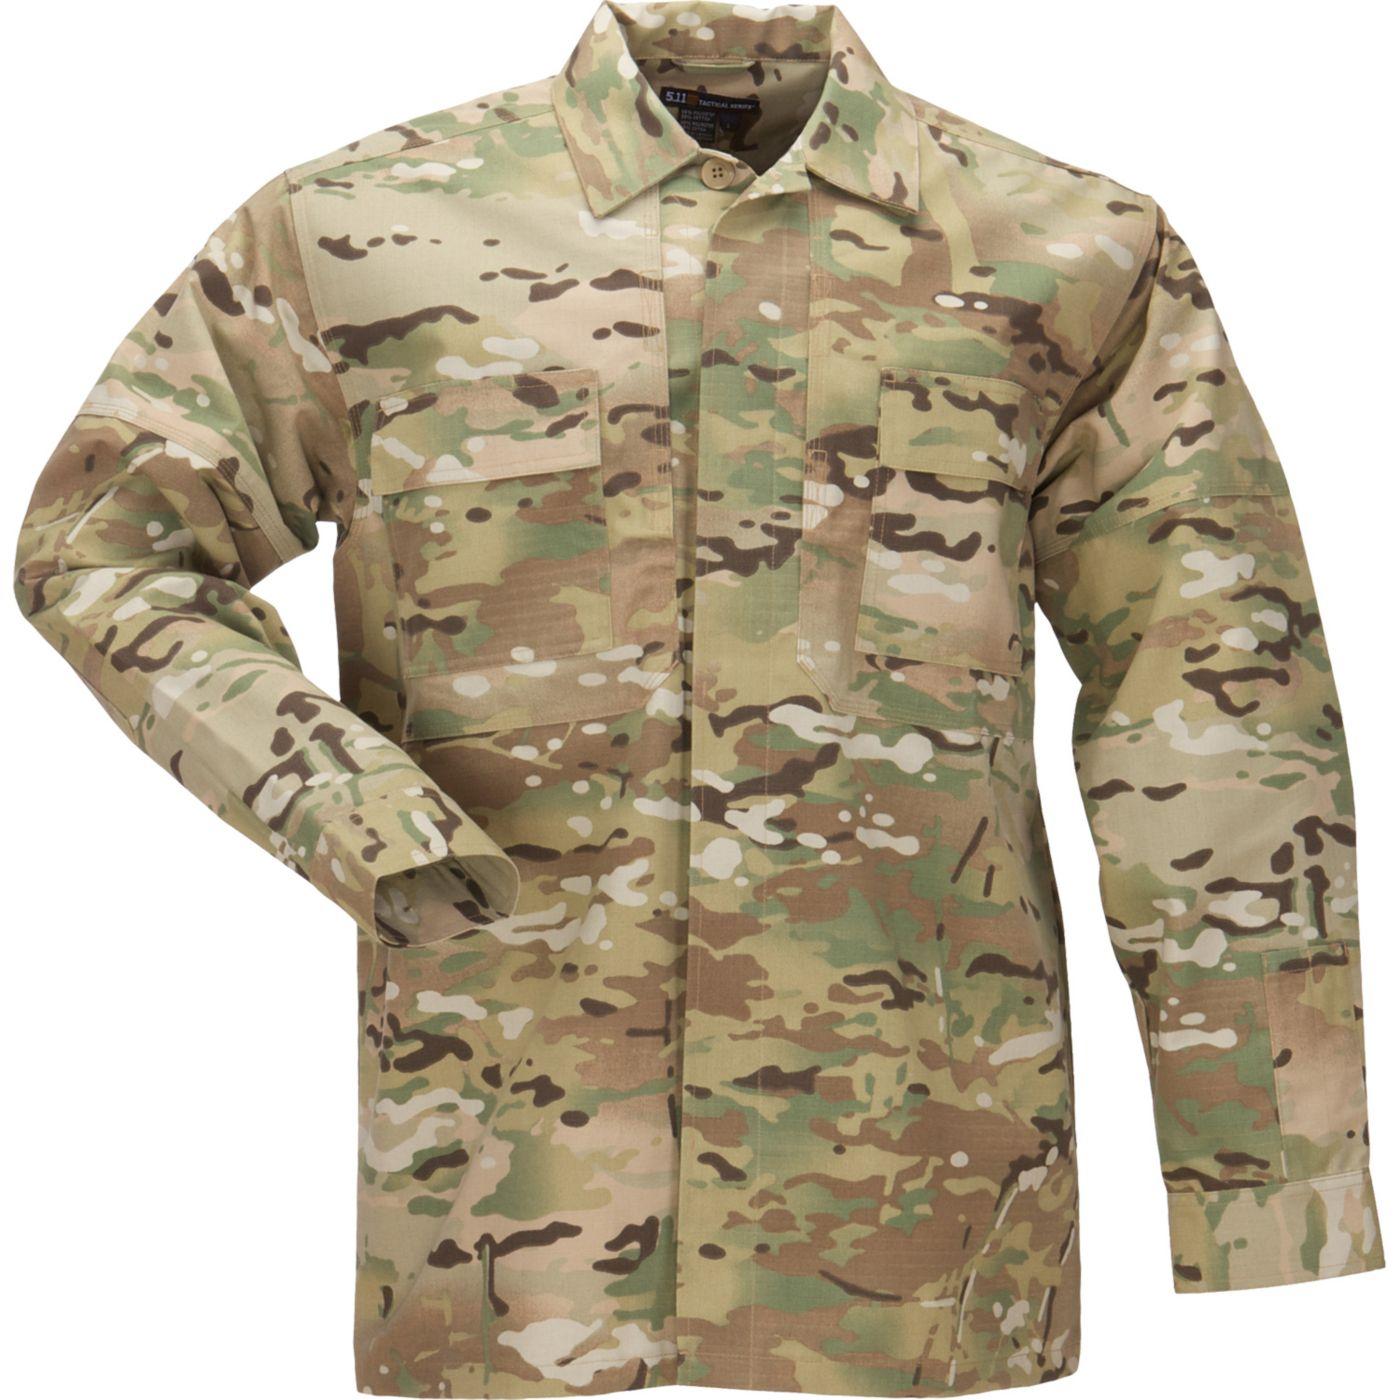 5.11 Tactical Men's Ripstop MultiCam TDU Long Sleeve Shirt